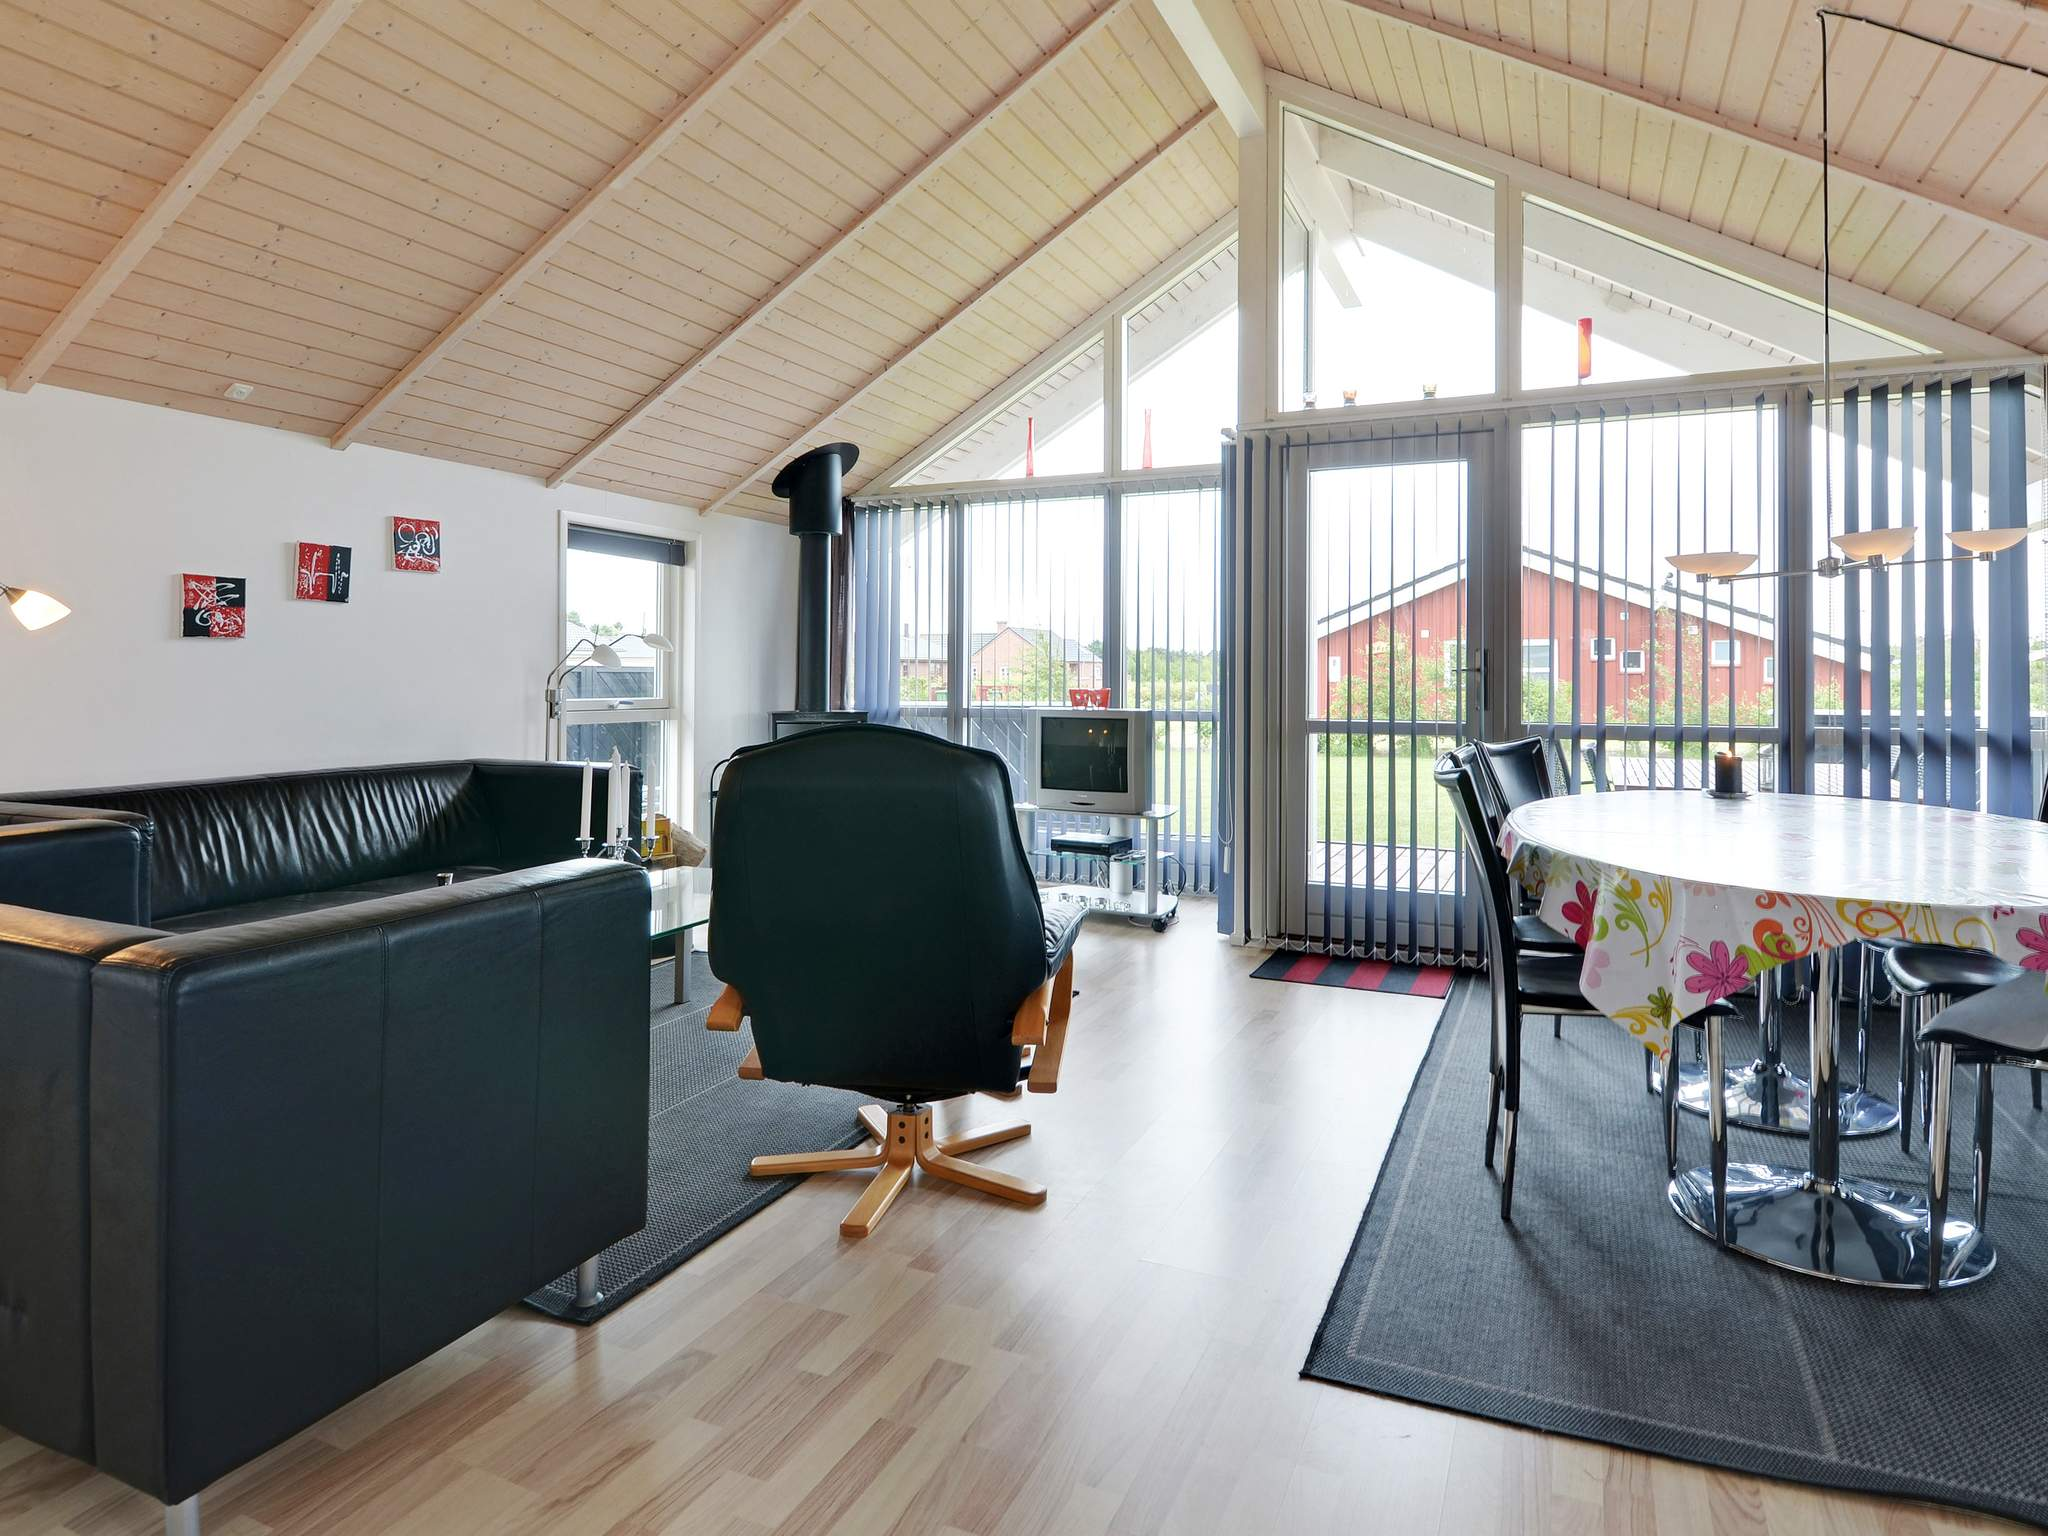 Ferienhaus Skaven Strand (160058), Tarm, , Westjütland, Dänemark, Bild 7